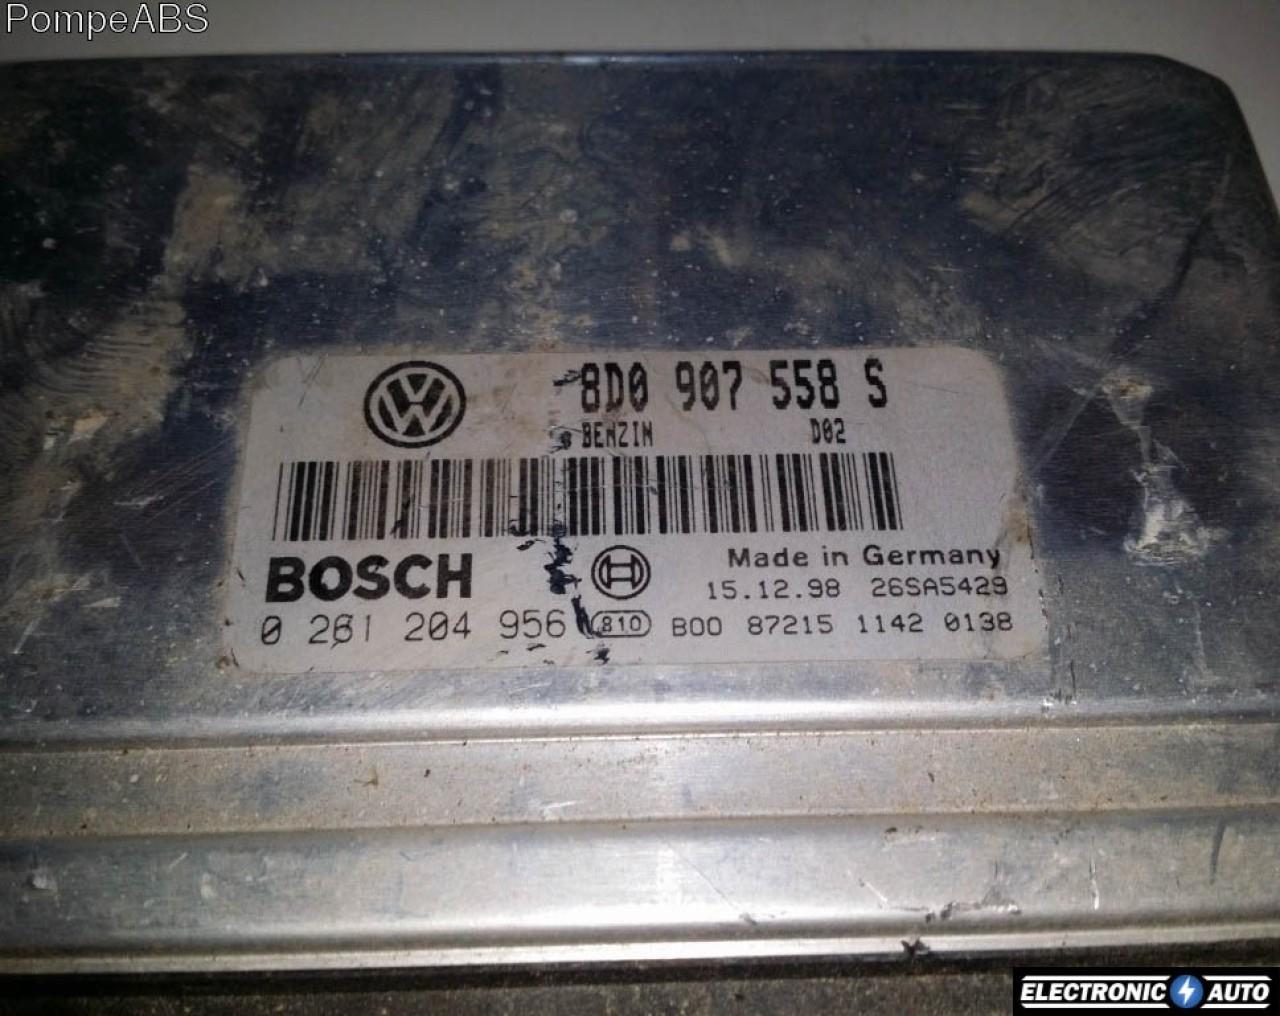 ECU Calculator motor VW Passat 1.8T 0261204956 M3.8.4 ADR